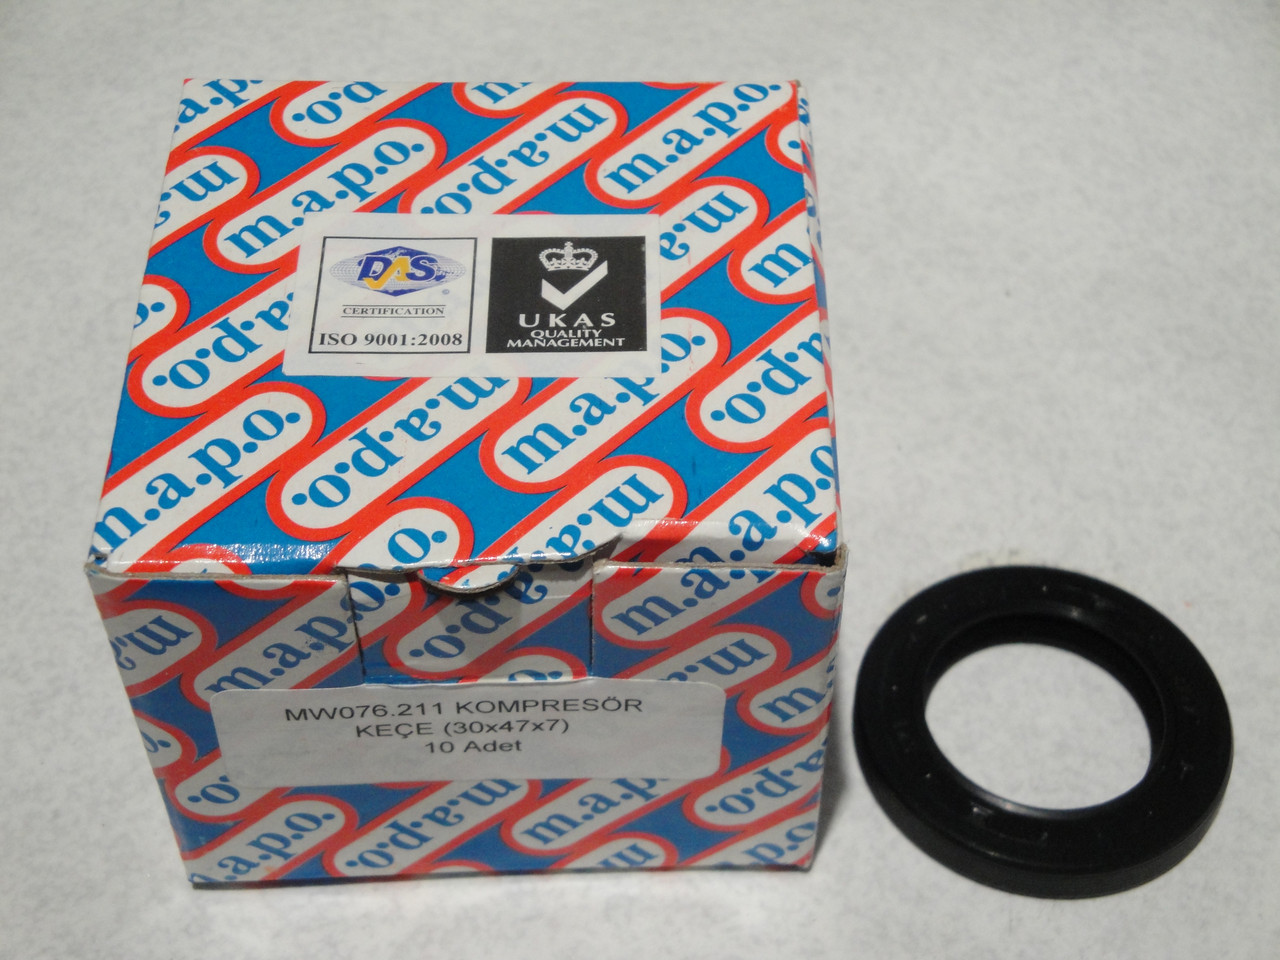 Сальник компрессора 30X47X7 БОГДАН A091-A092 (MW076.211) MAPO